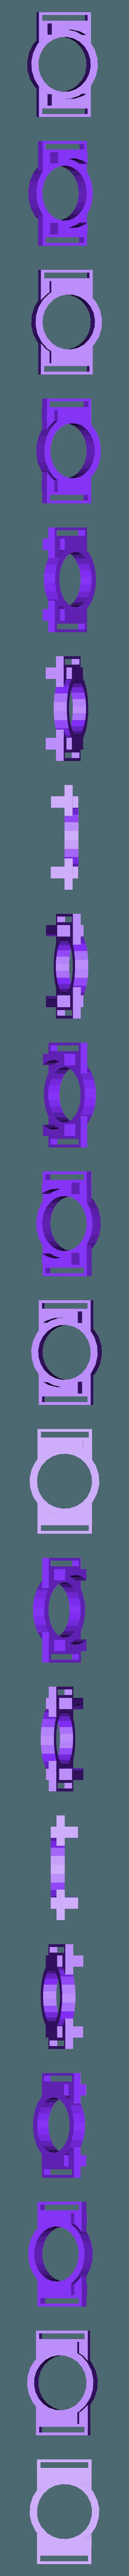 lens_protectorLG.stl Download free STL file Xiaomi Yi Lens Protector With Strap Holes • 3D printer design, MaxPoindexter